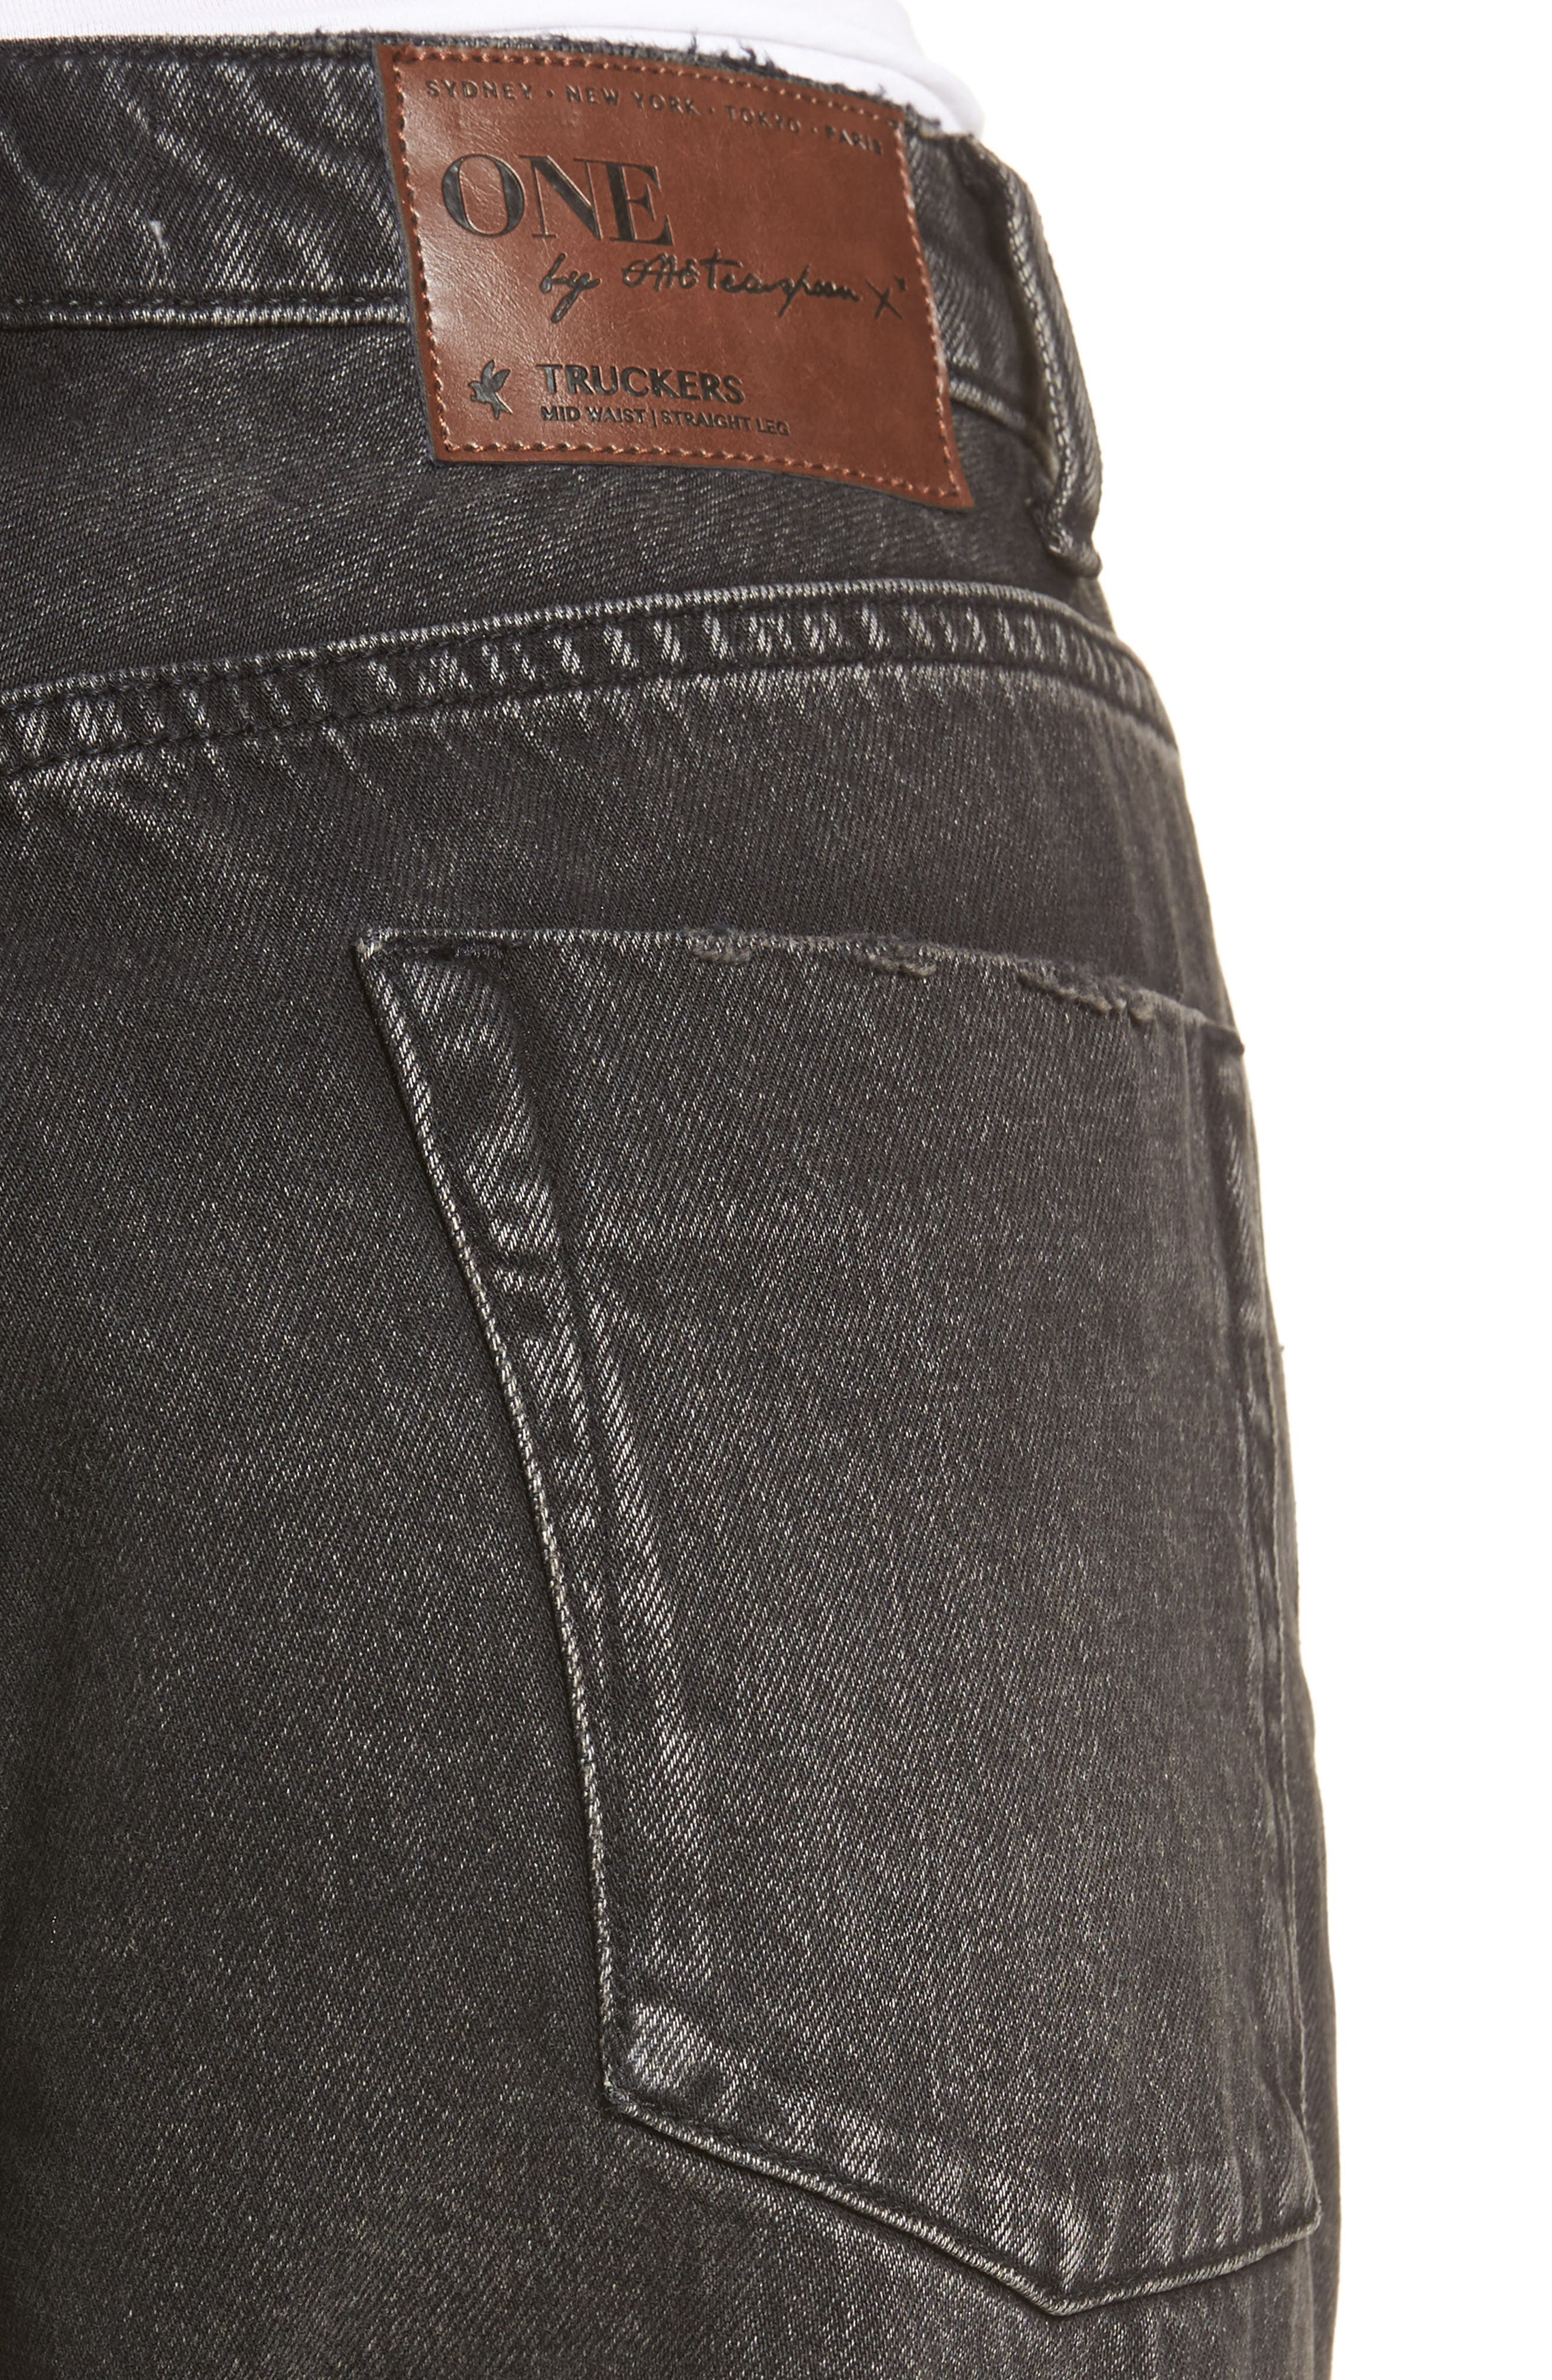 Truckers Straight Leg Jeans,                             Alternate thumbnail 4, color,                             001